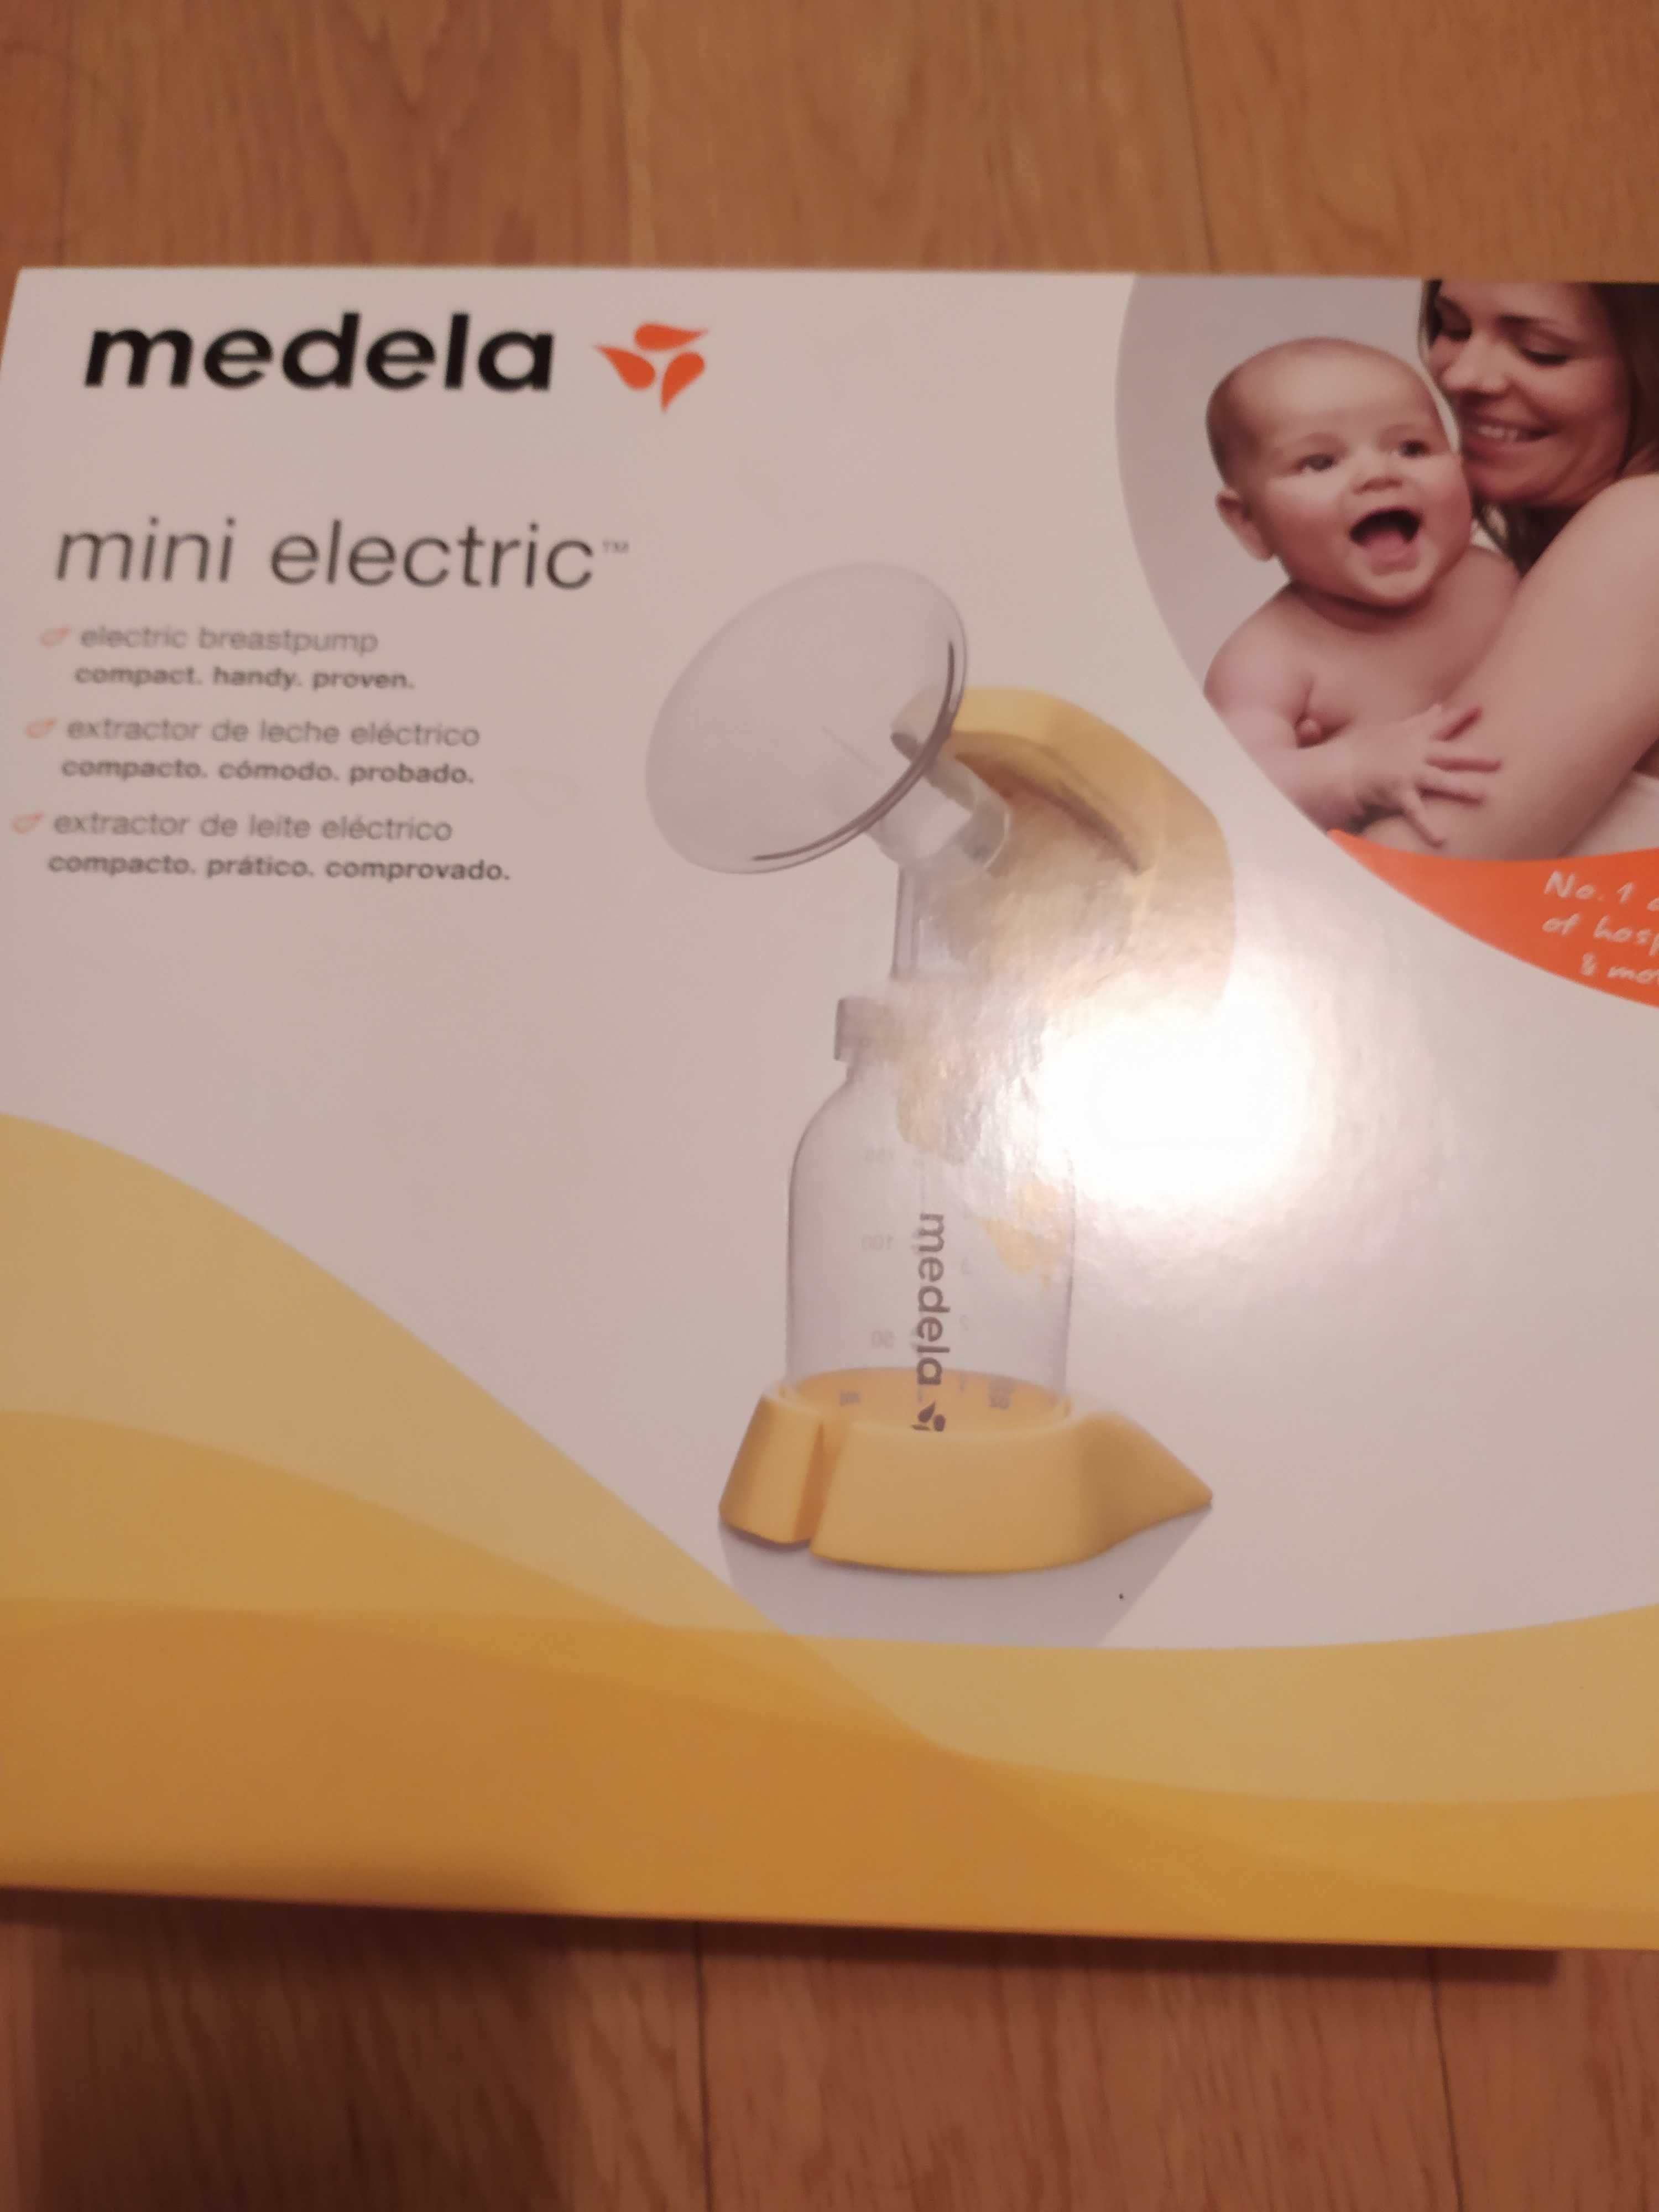 Mini eletric - Extrator de leite materno elétrico, marca medela